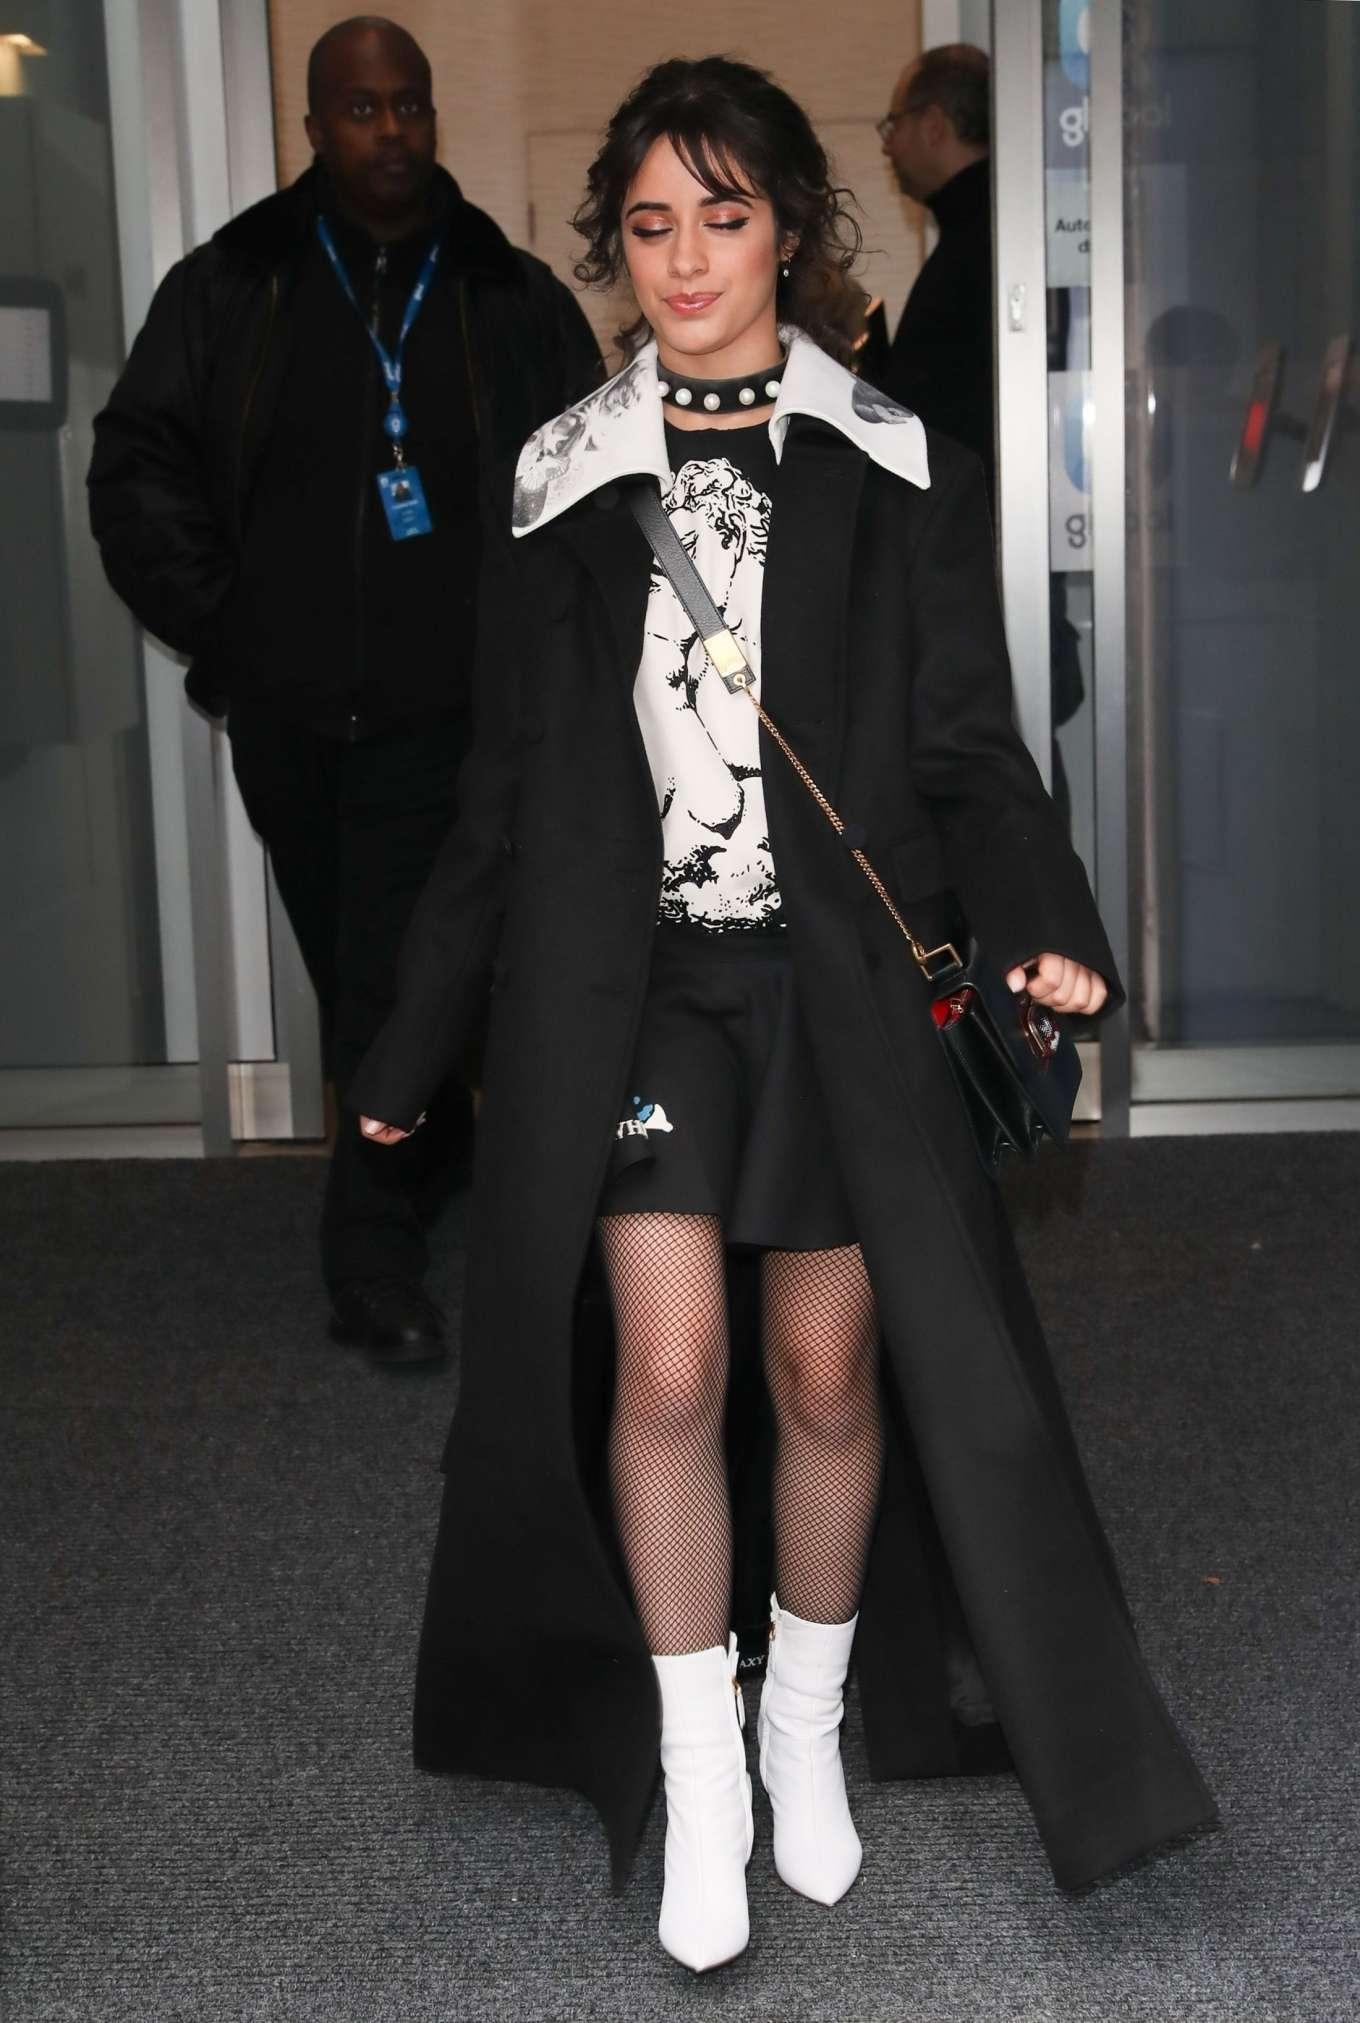 Camila Cabello - Outside the Capital Breakfast show in London